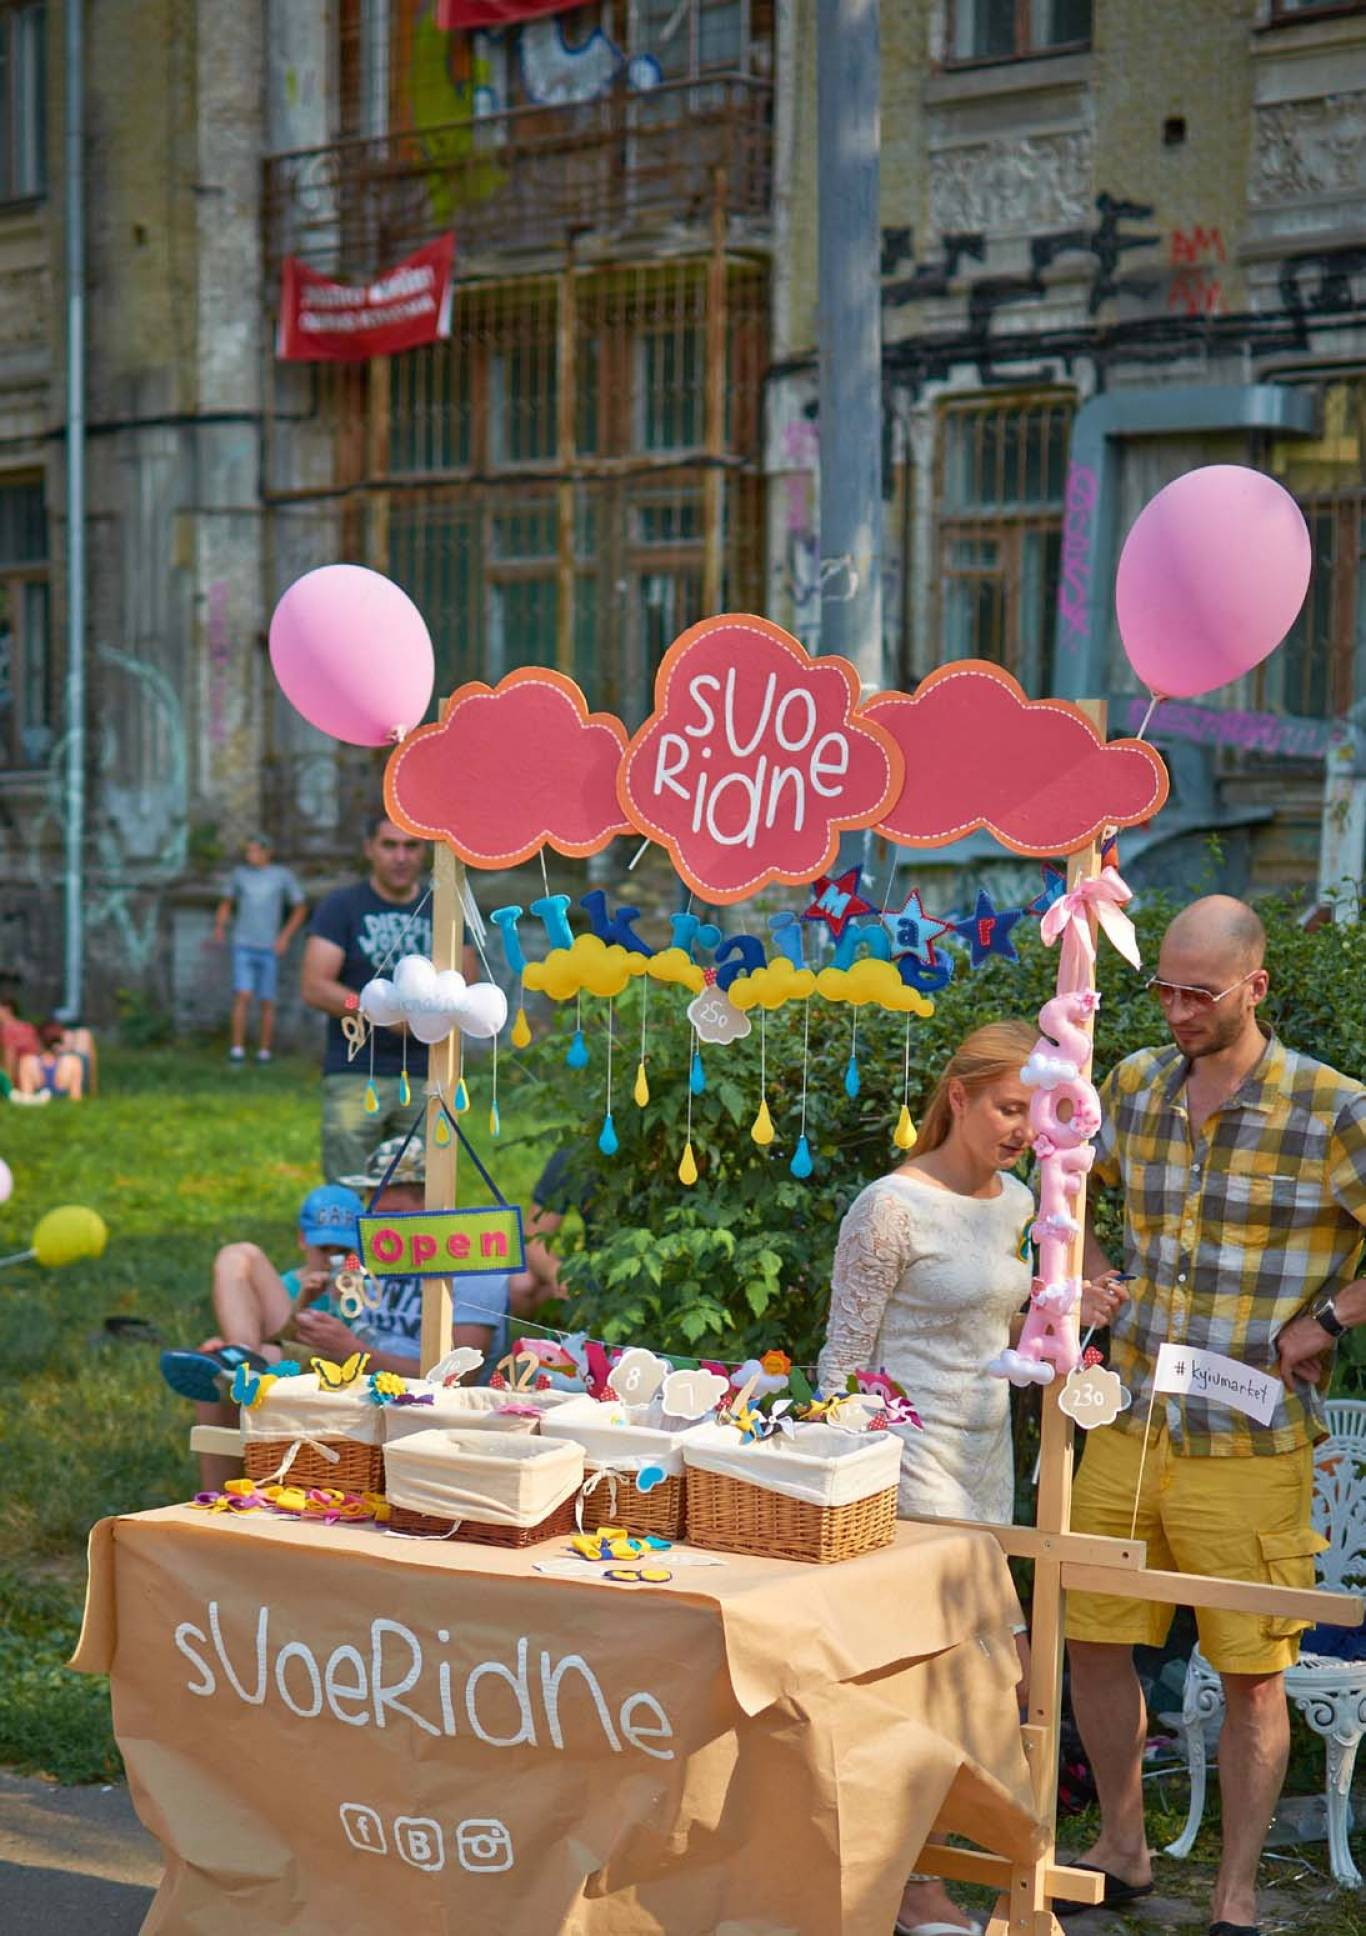 КиївМаркет-Барахолка на Пейзажній алеї